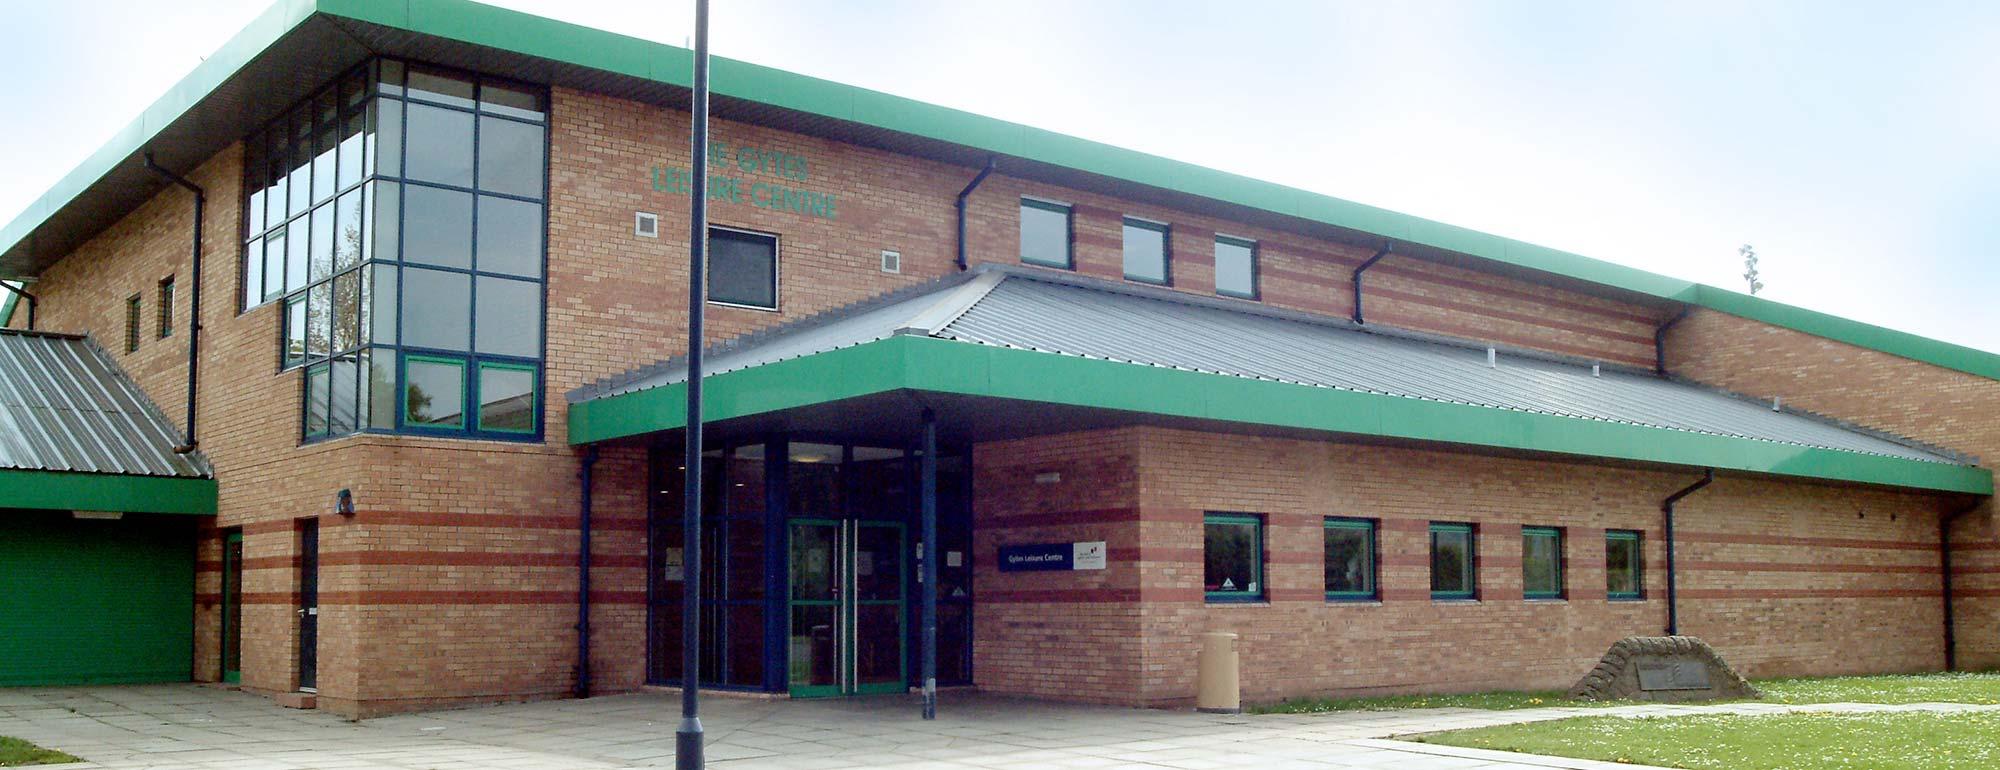 health-gyms-Gytes-Leisure-Centre